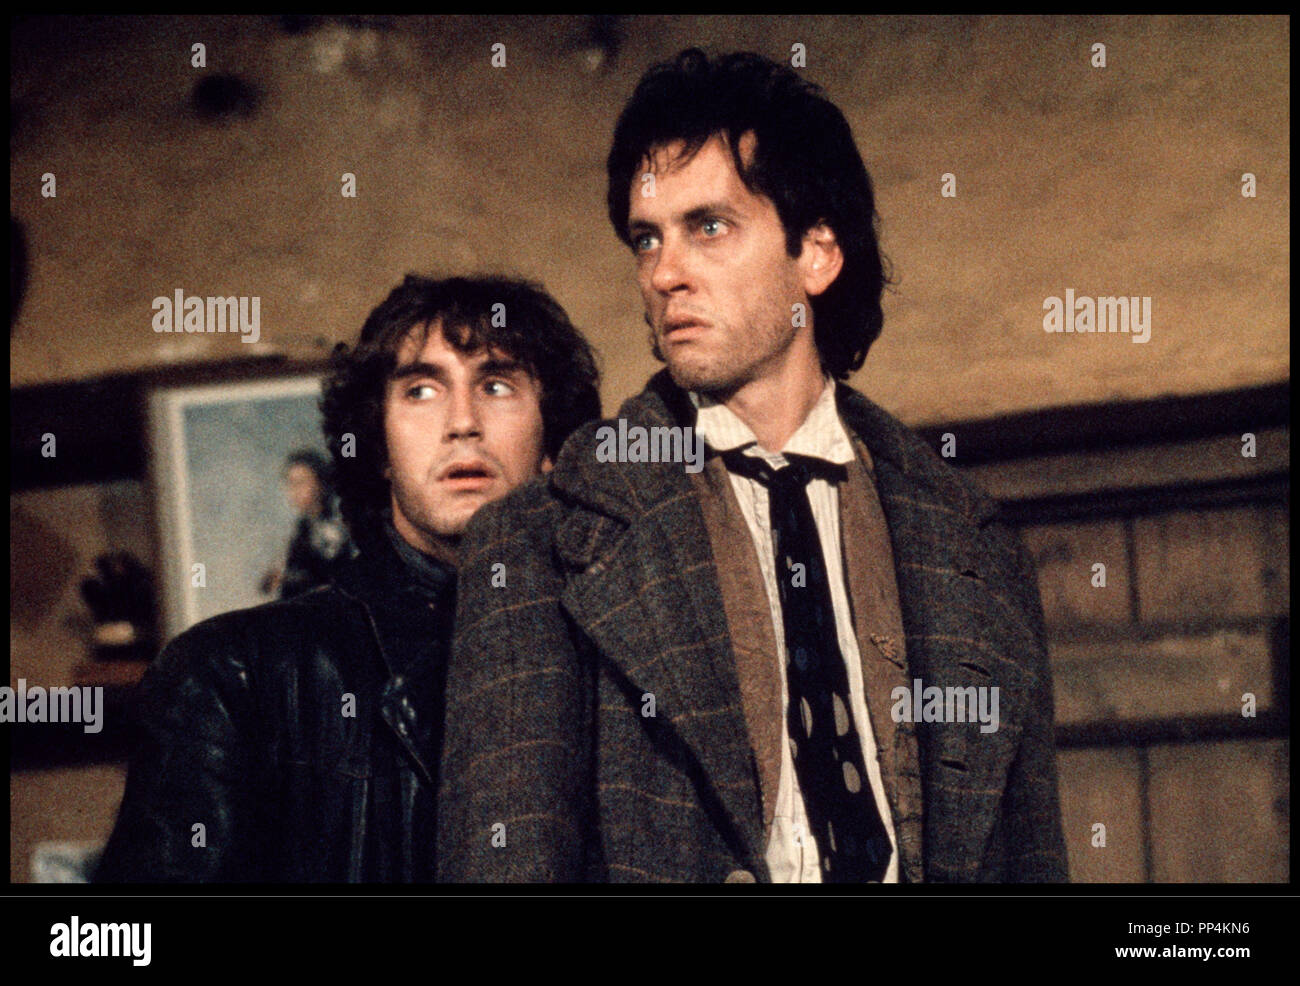 Prod DB © Handmade Films / DR WITHNAIL ET MOI (WITHNAIL & I) de Bruce Robinson 1987 GB - Stock Image